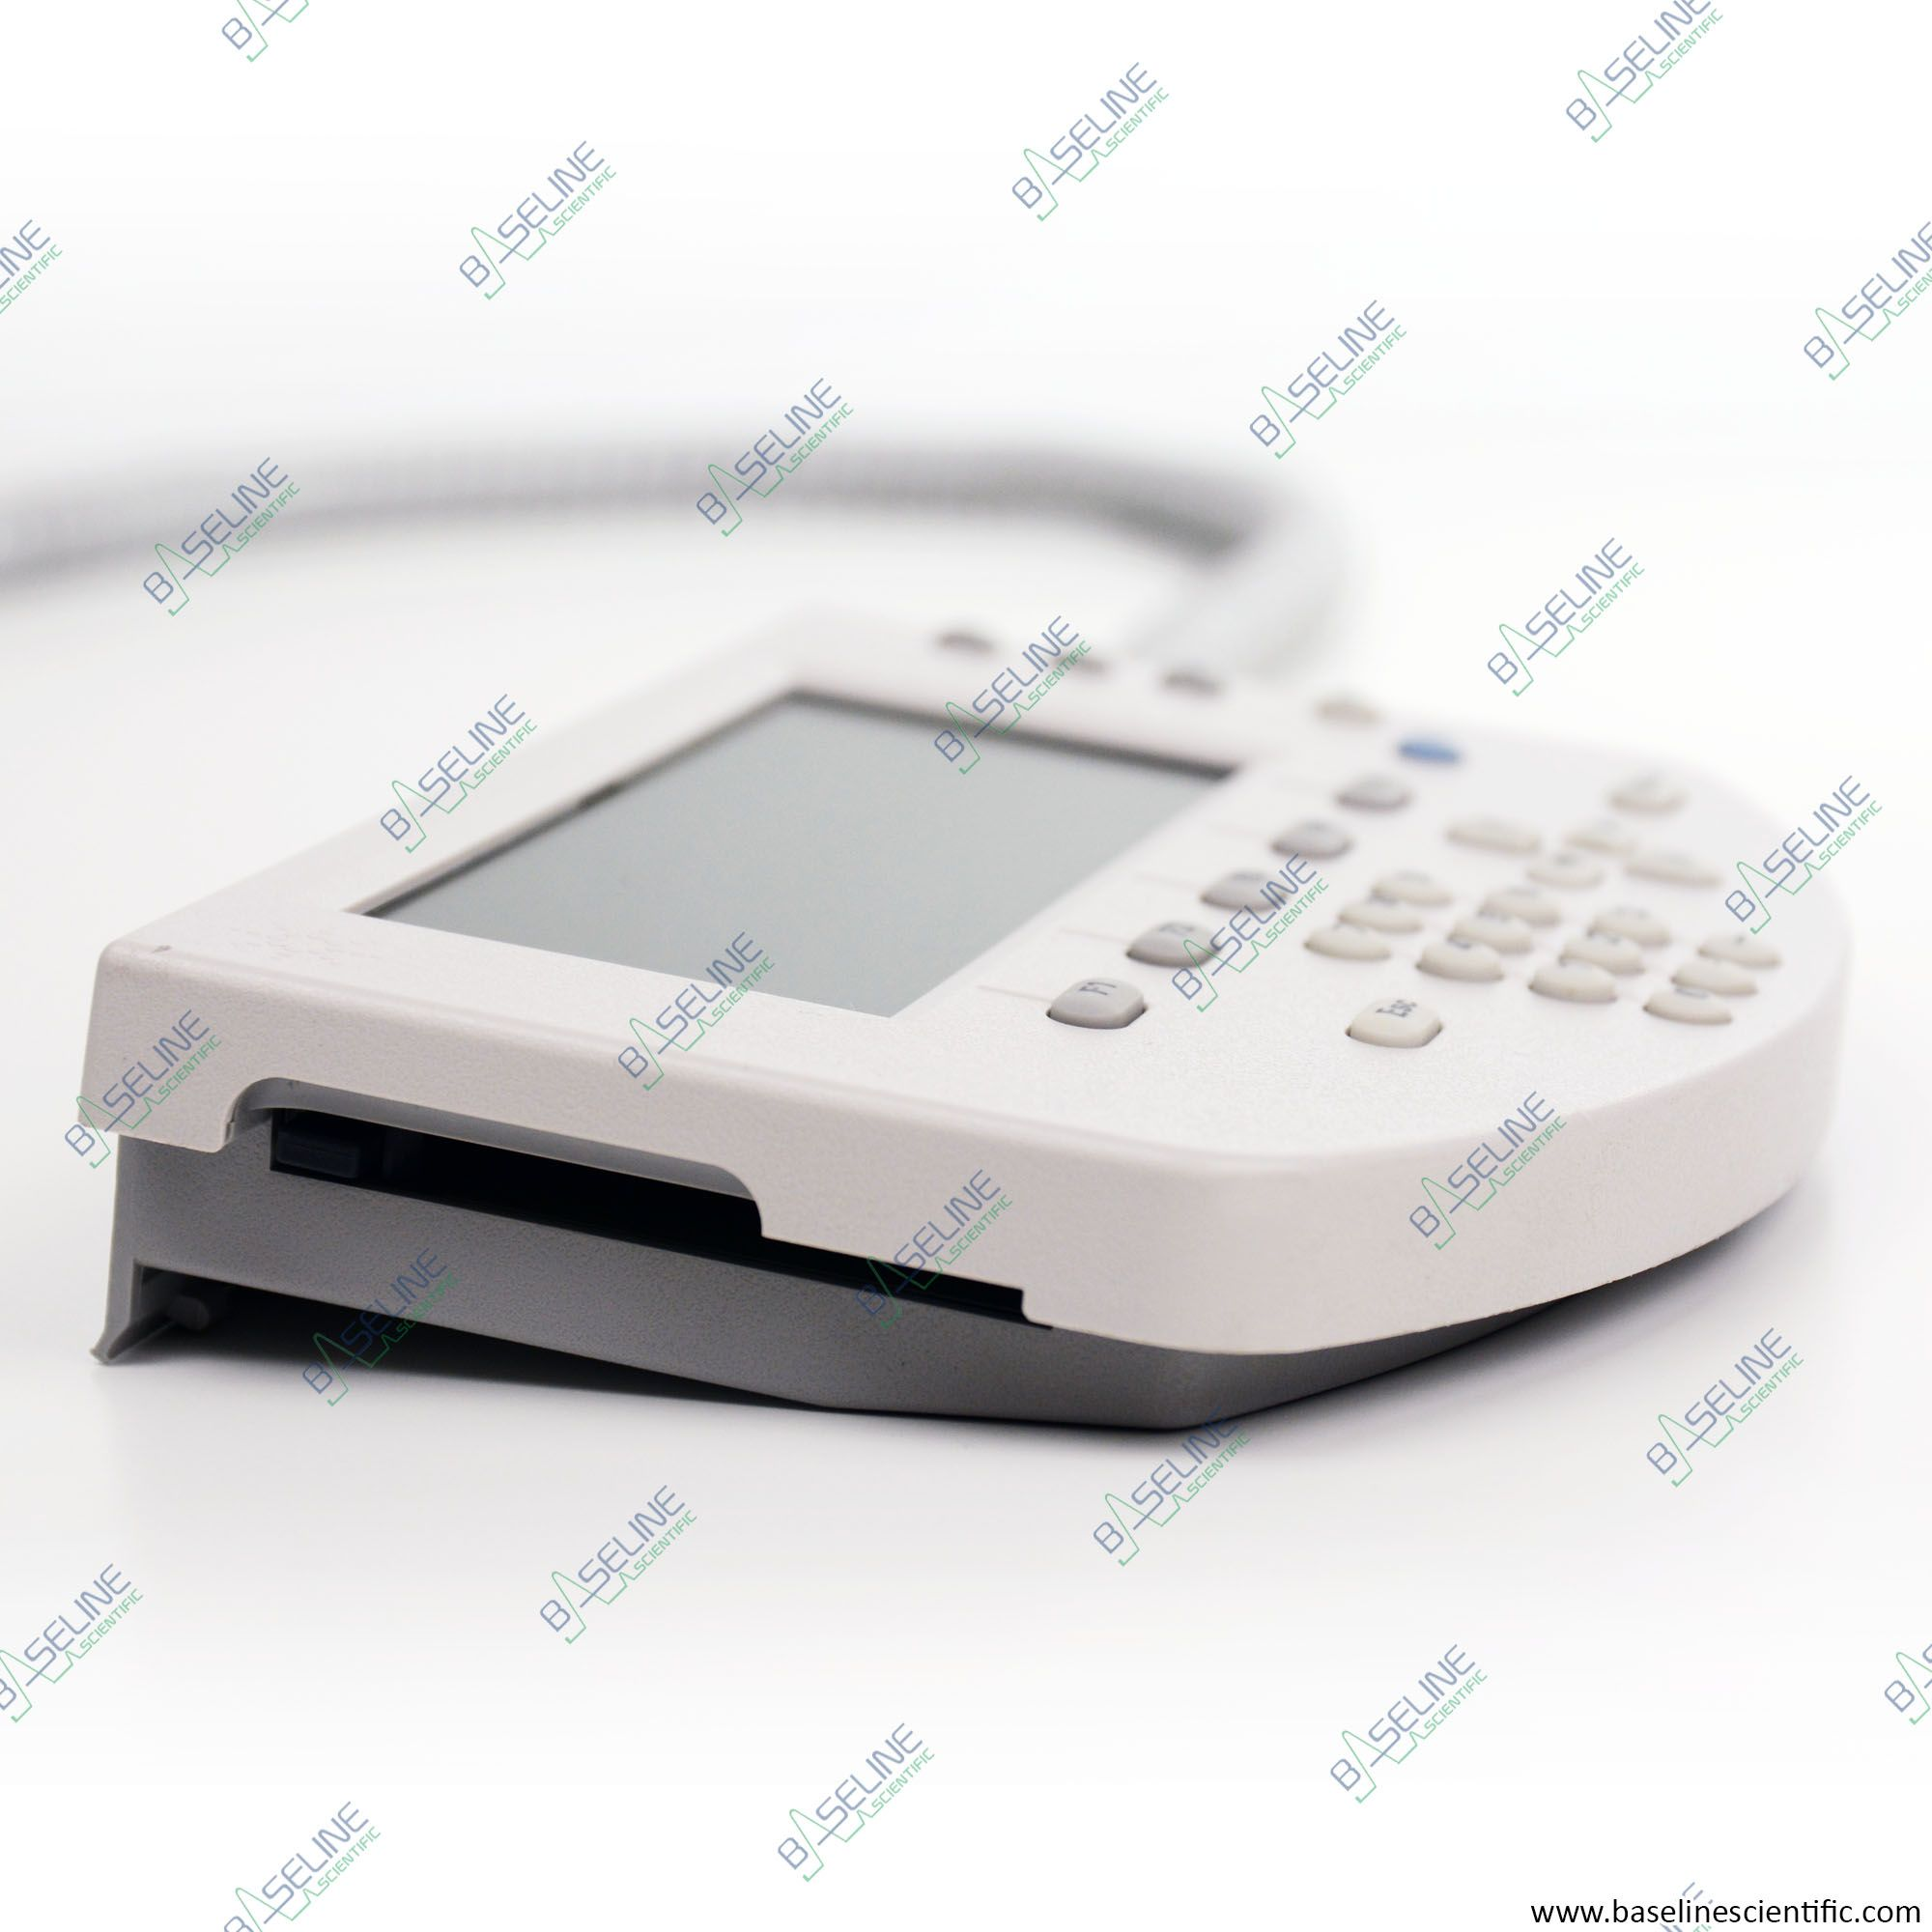 Refurbished Agilent HP 1100 G1323B  Handeld Control Module (GameBoy Controller) with 30-DAY WARRANTY